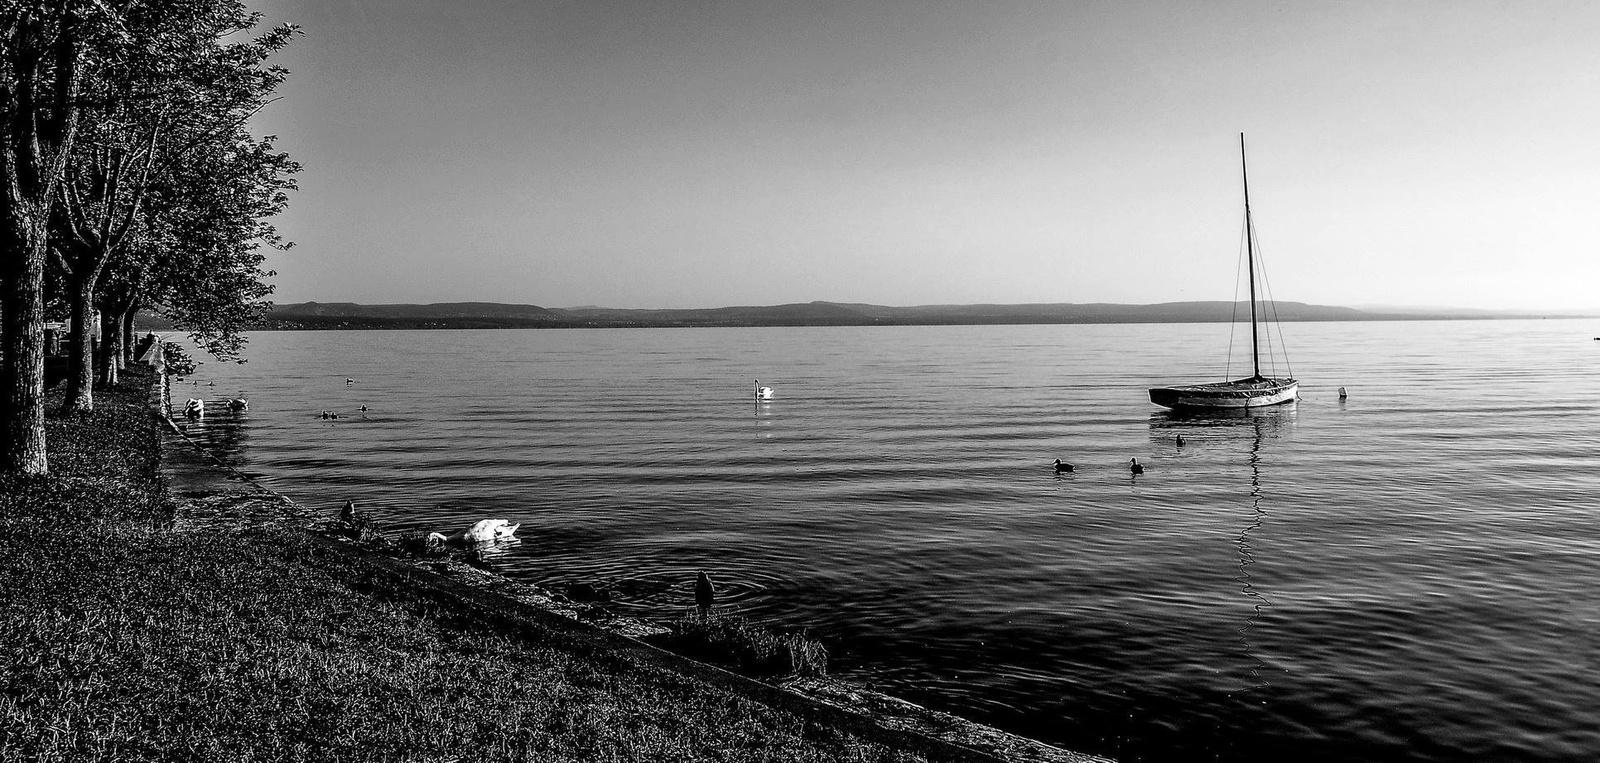 Kora reggel a parton FF